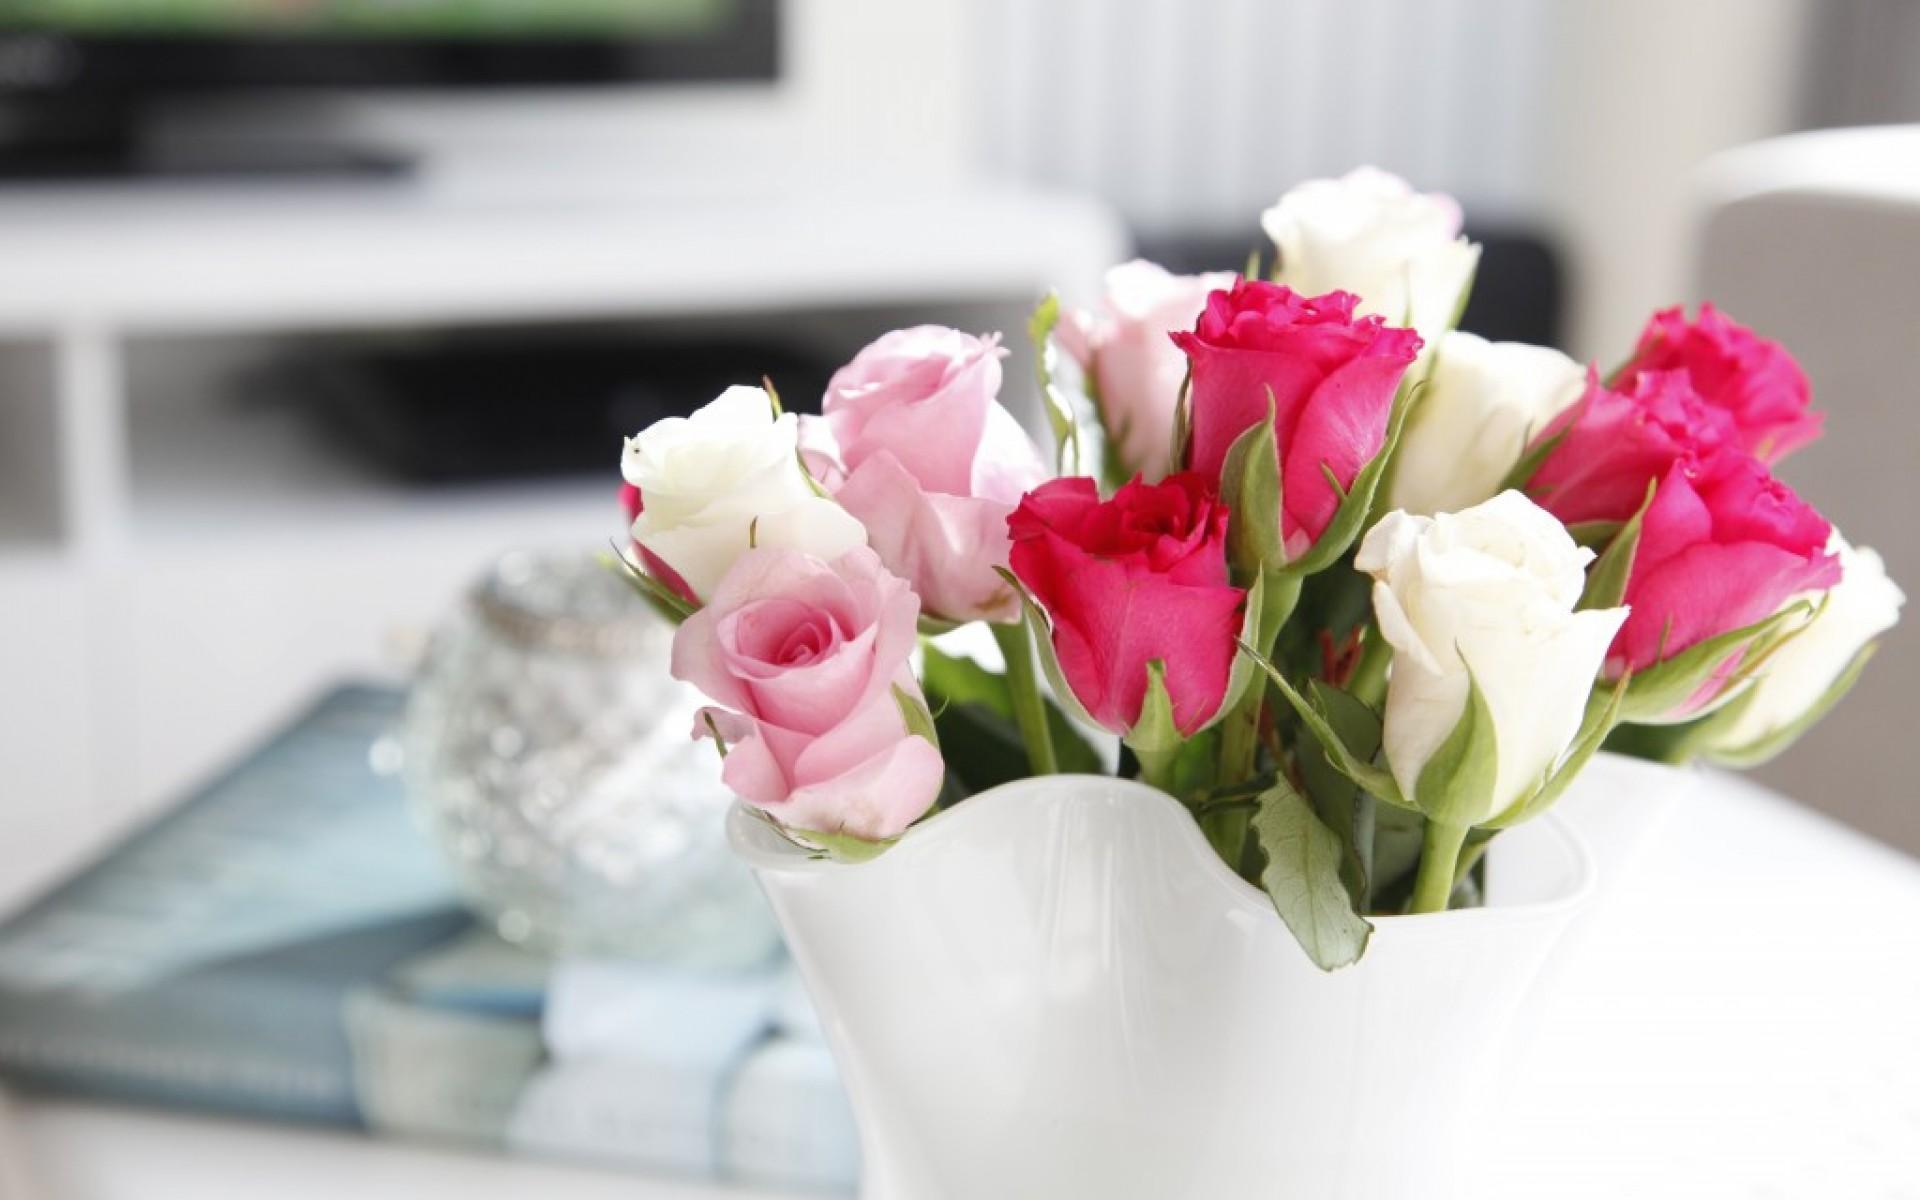 Hd wallpaper rose - White Rose Wallpapers Full Hd Wallpaper Search